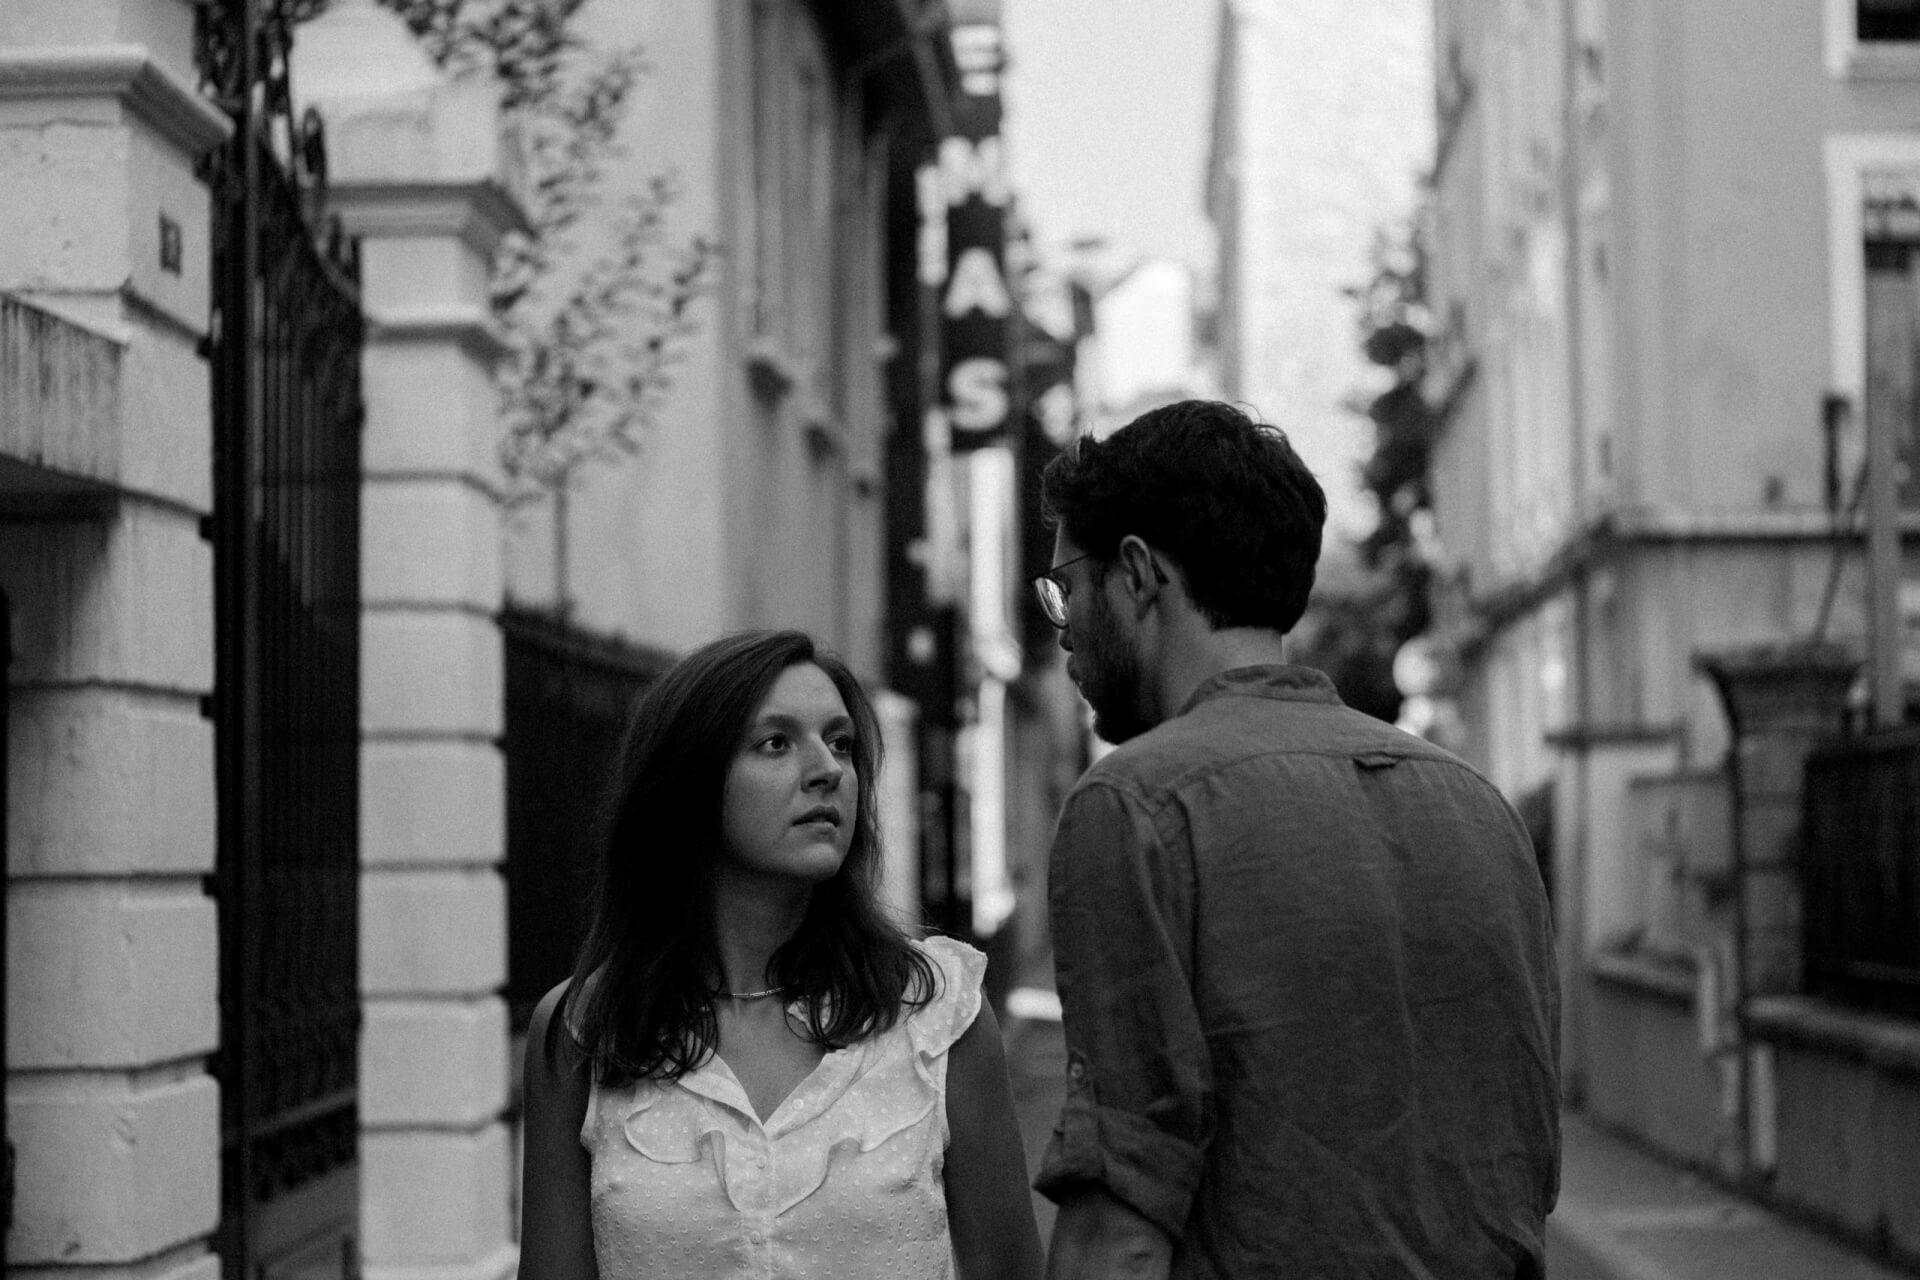 séance photo de couple urbaine